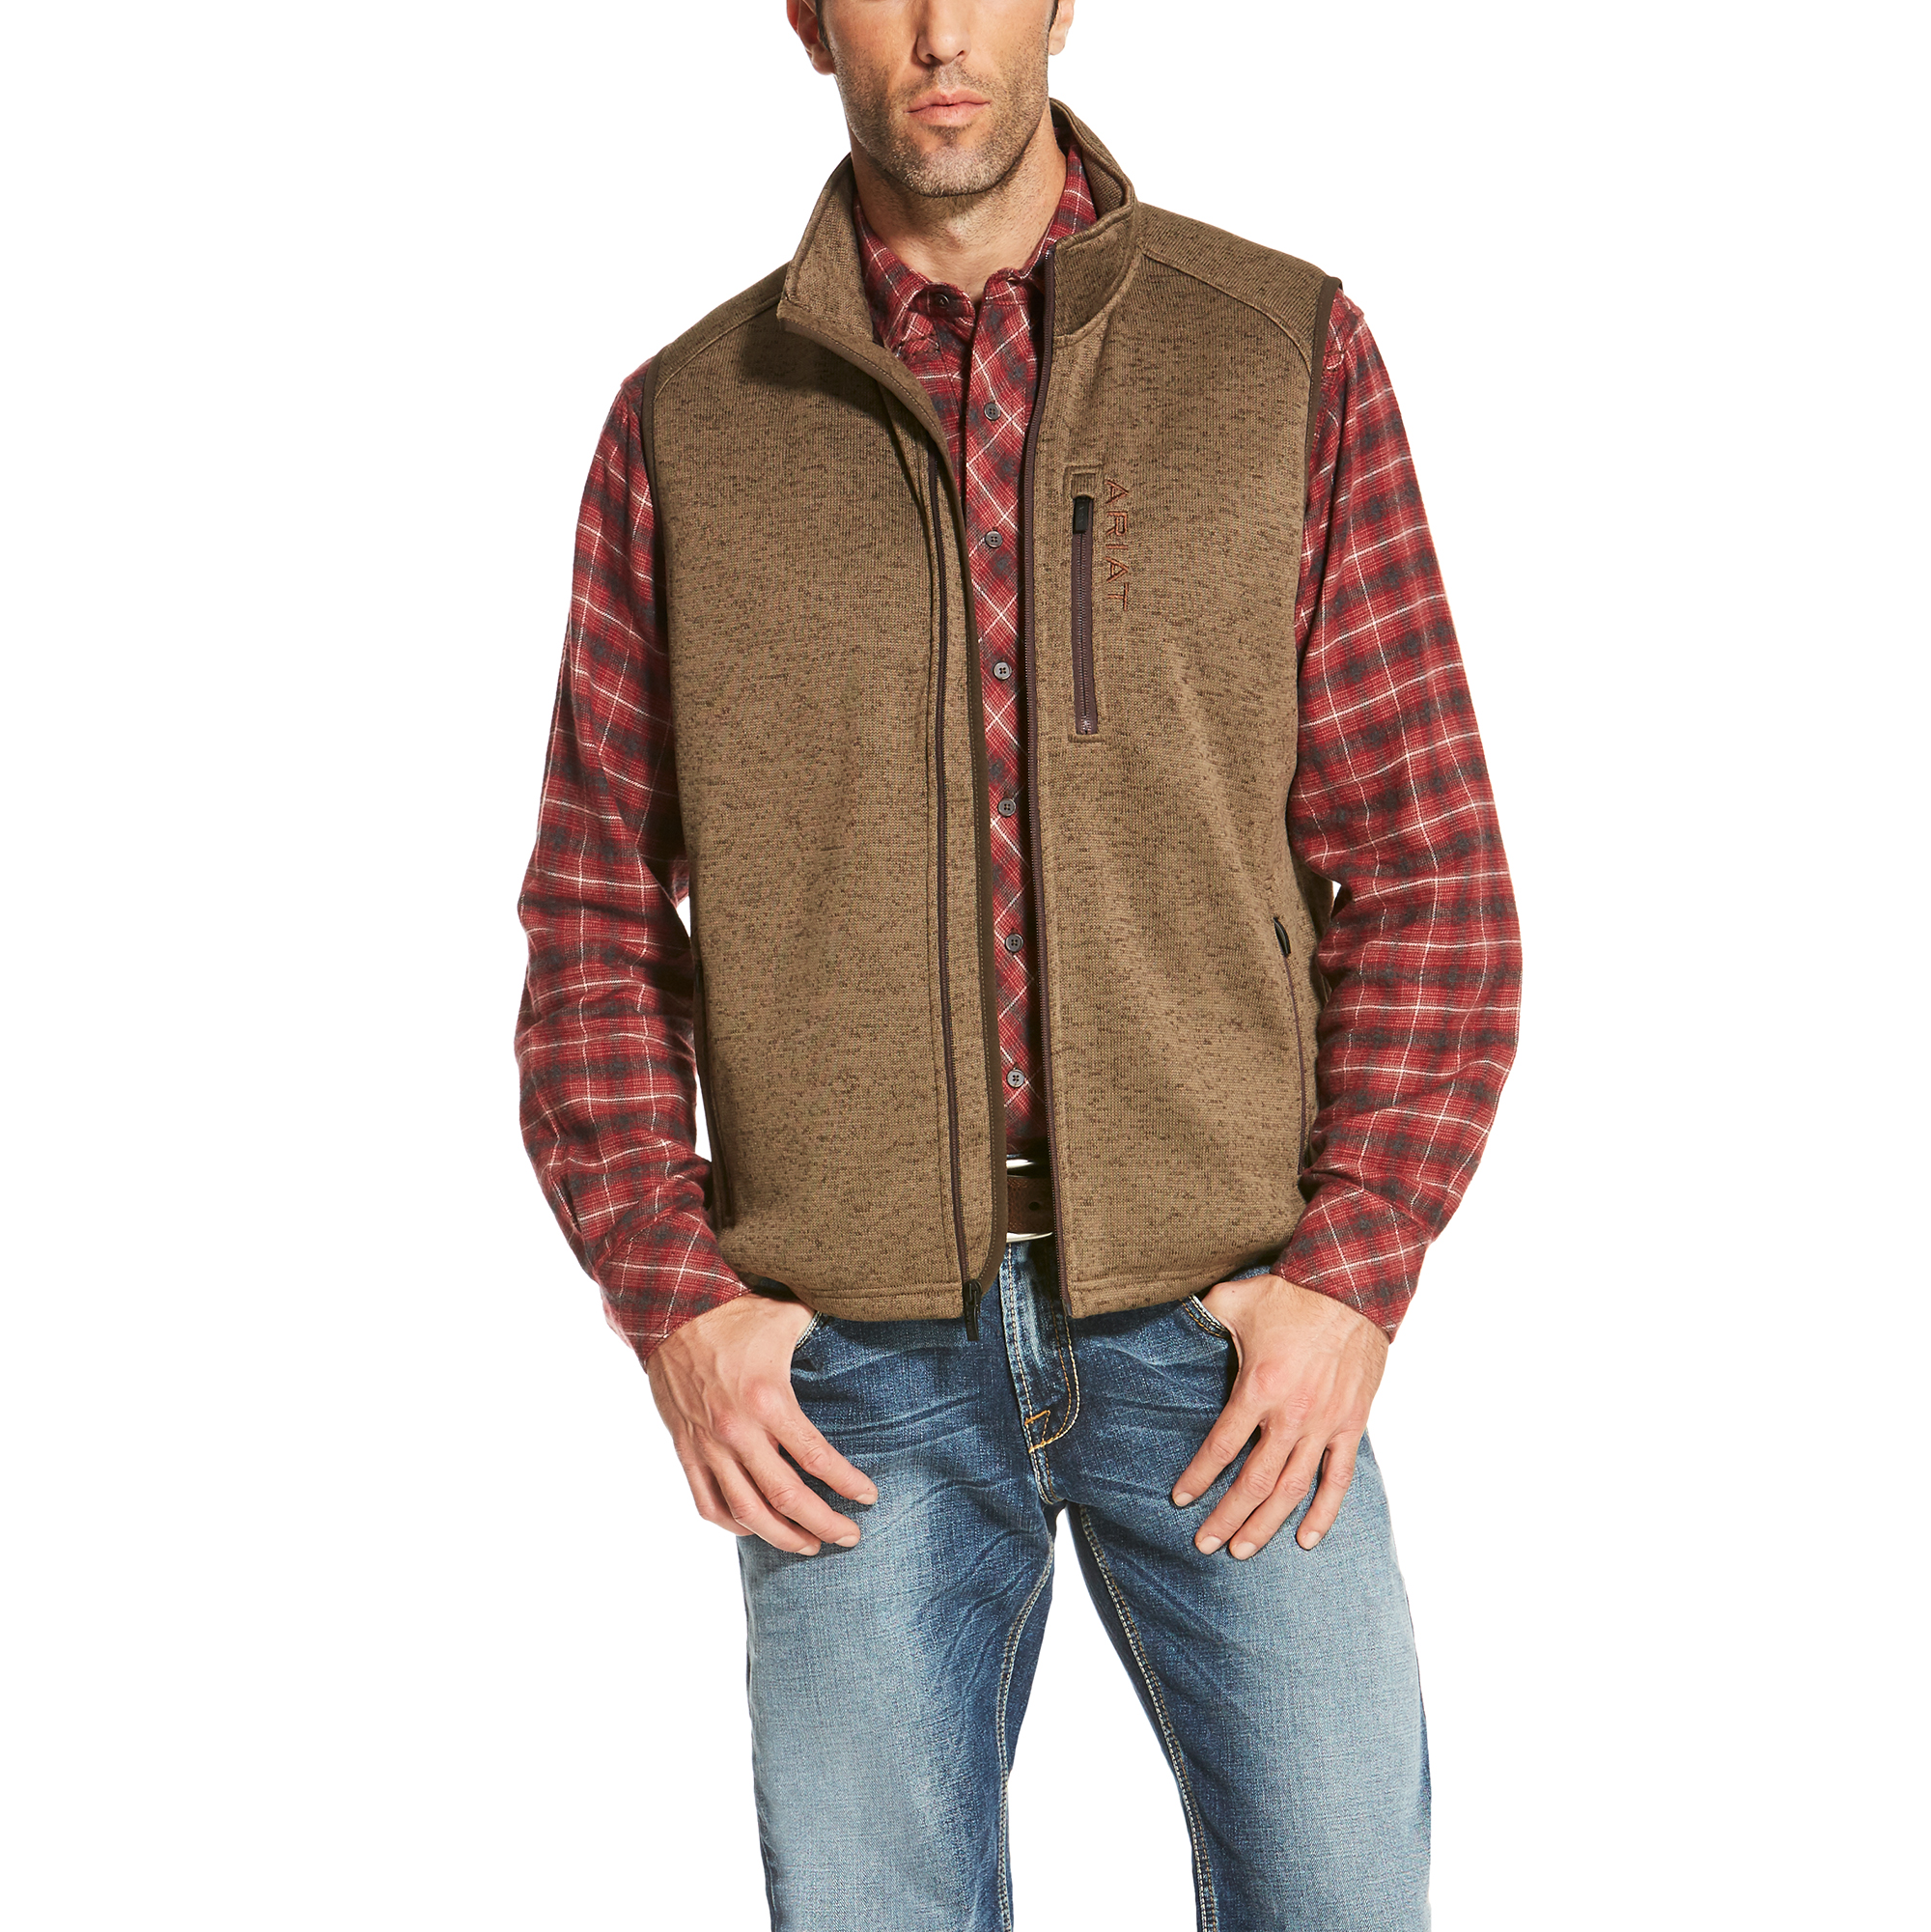 Caldwell Full Zip Vest from Ariat